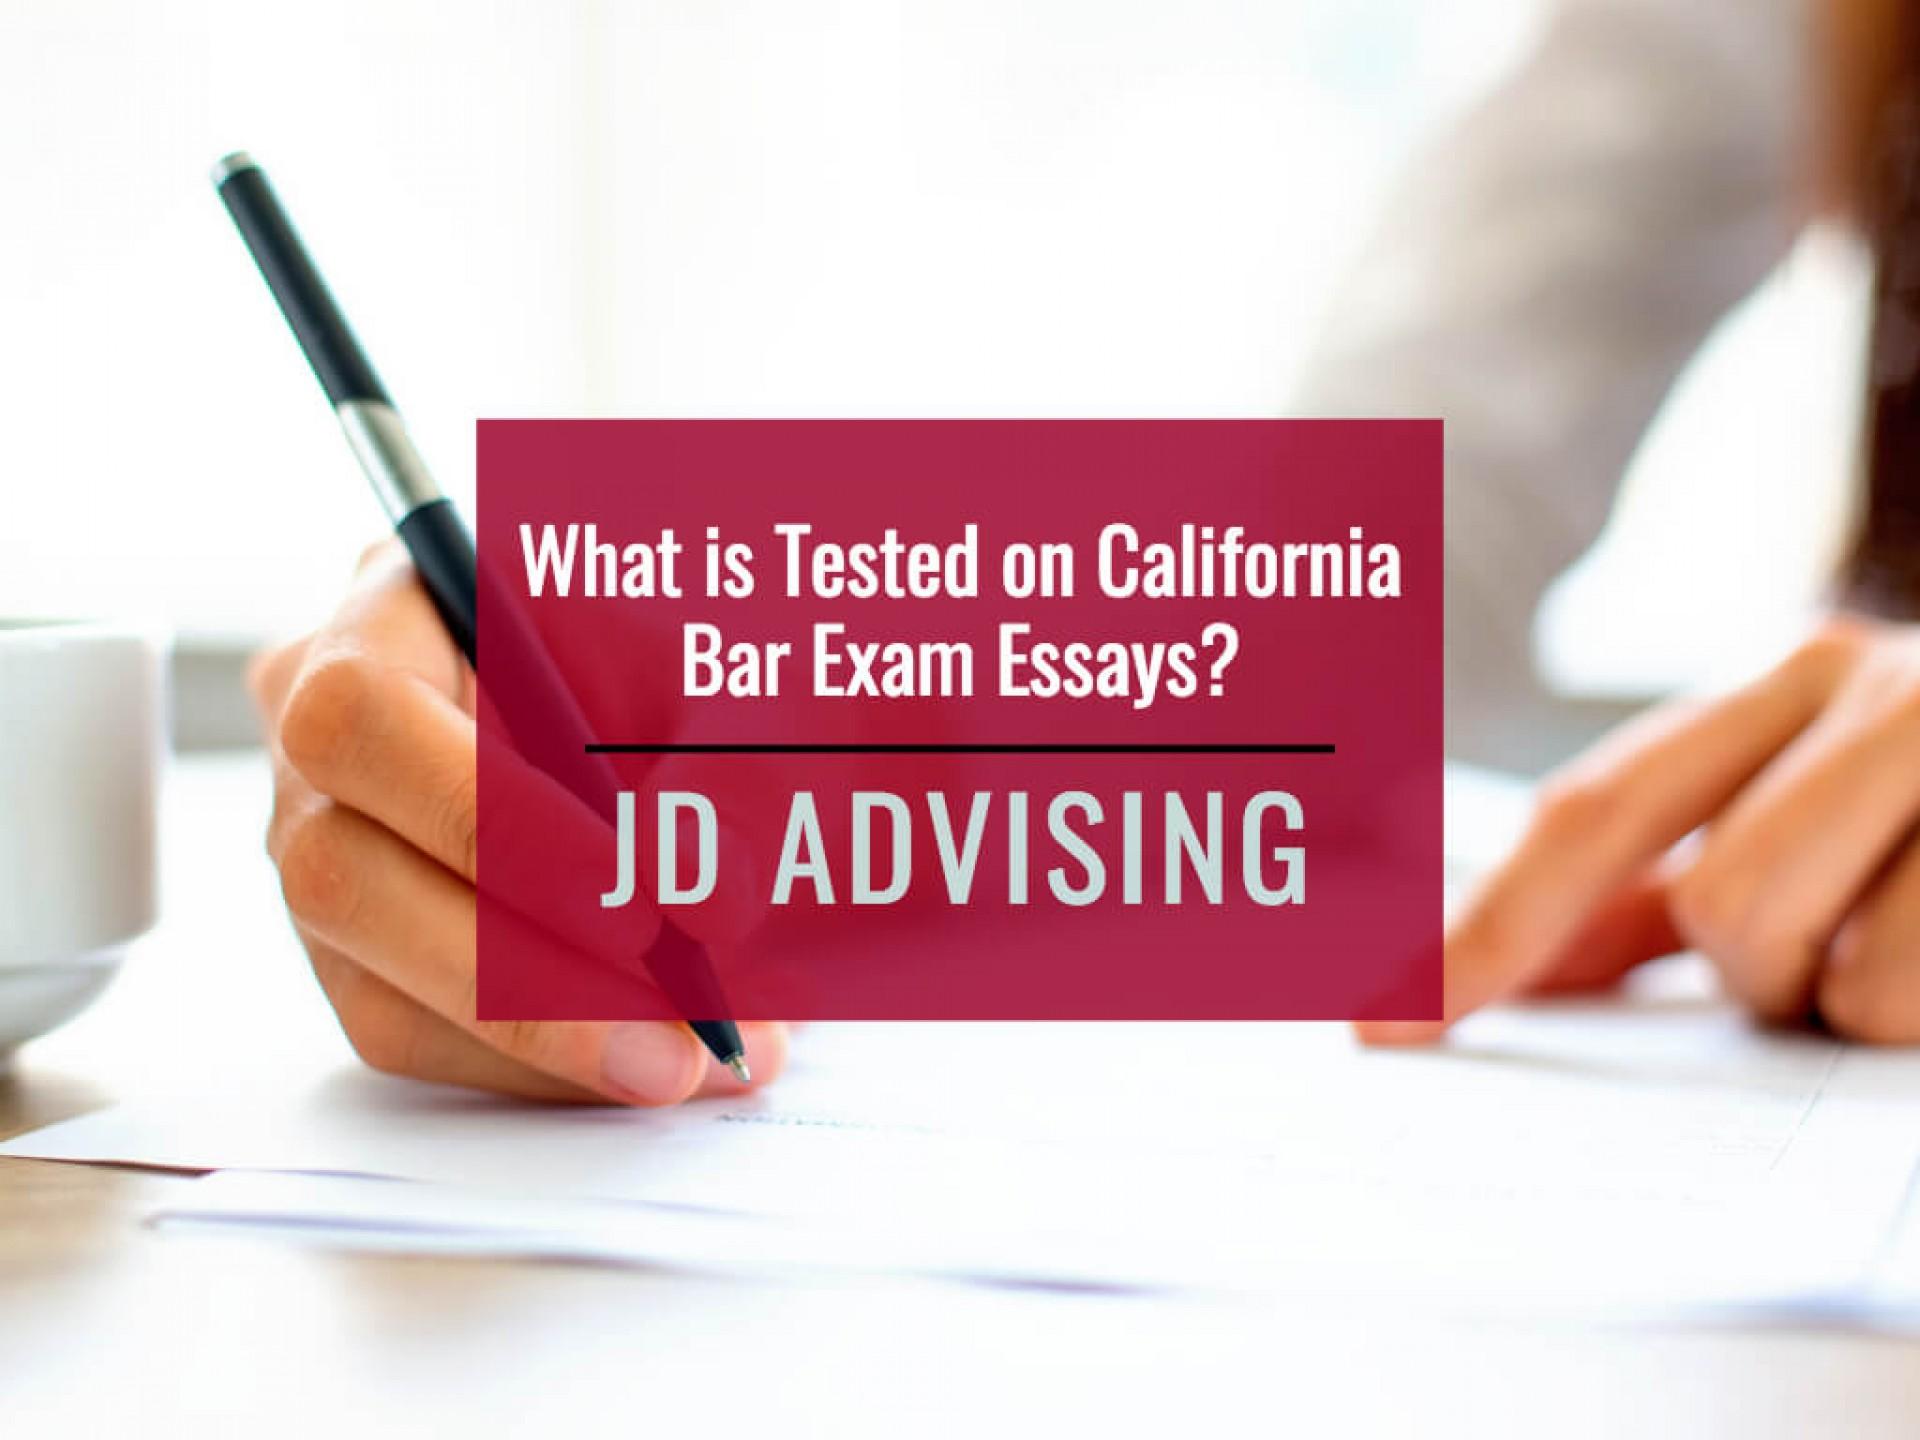 011 California Bar Essays Essayple Marvelous Exam Graded February 2018 How Are 1920